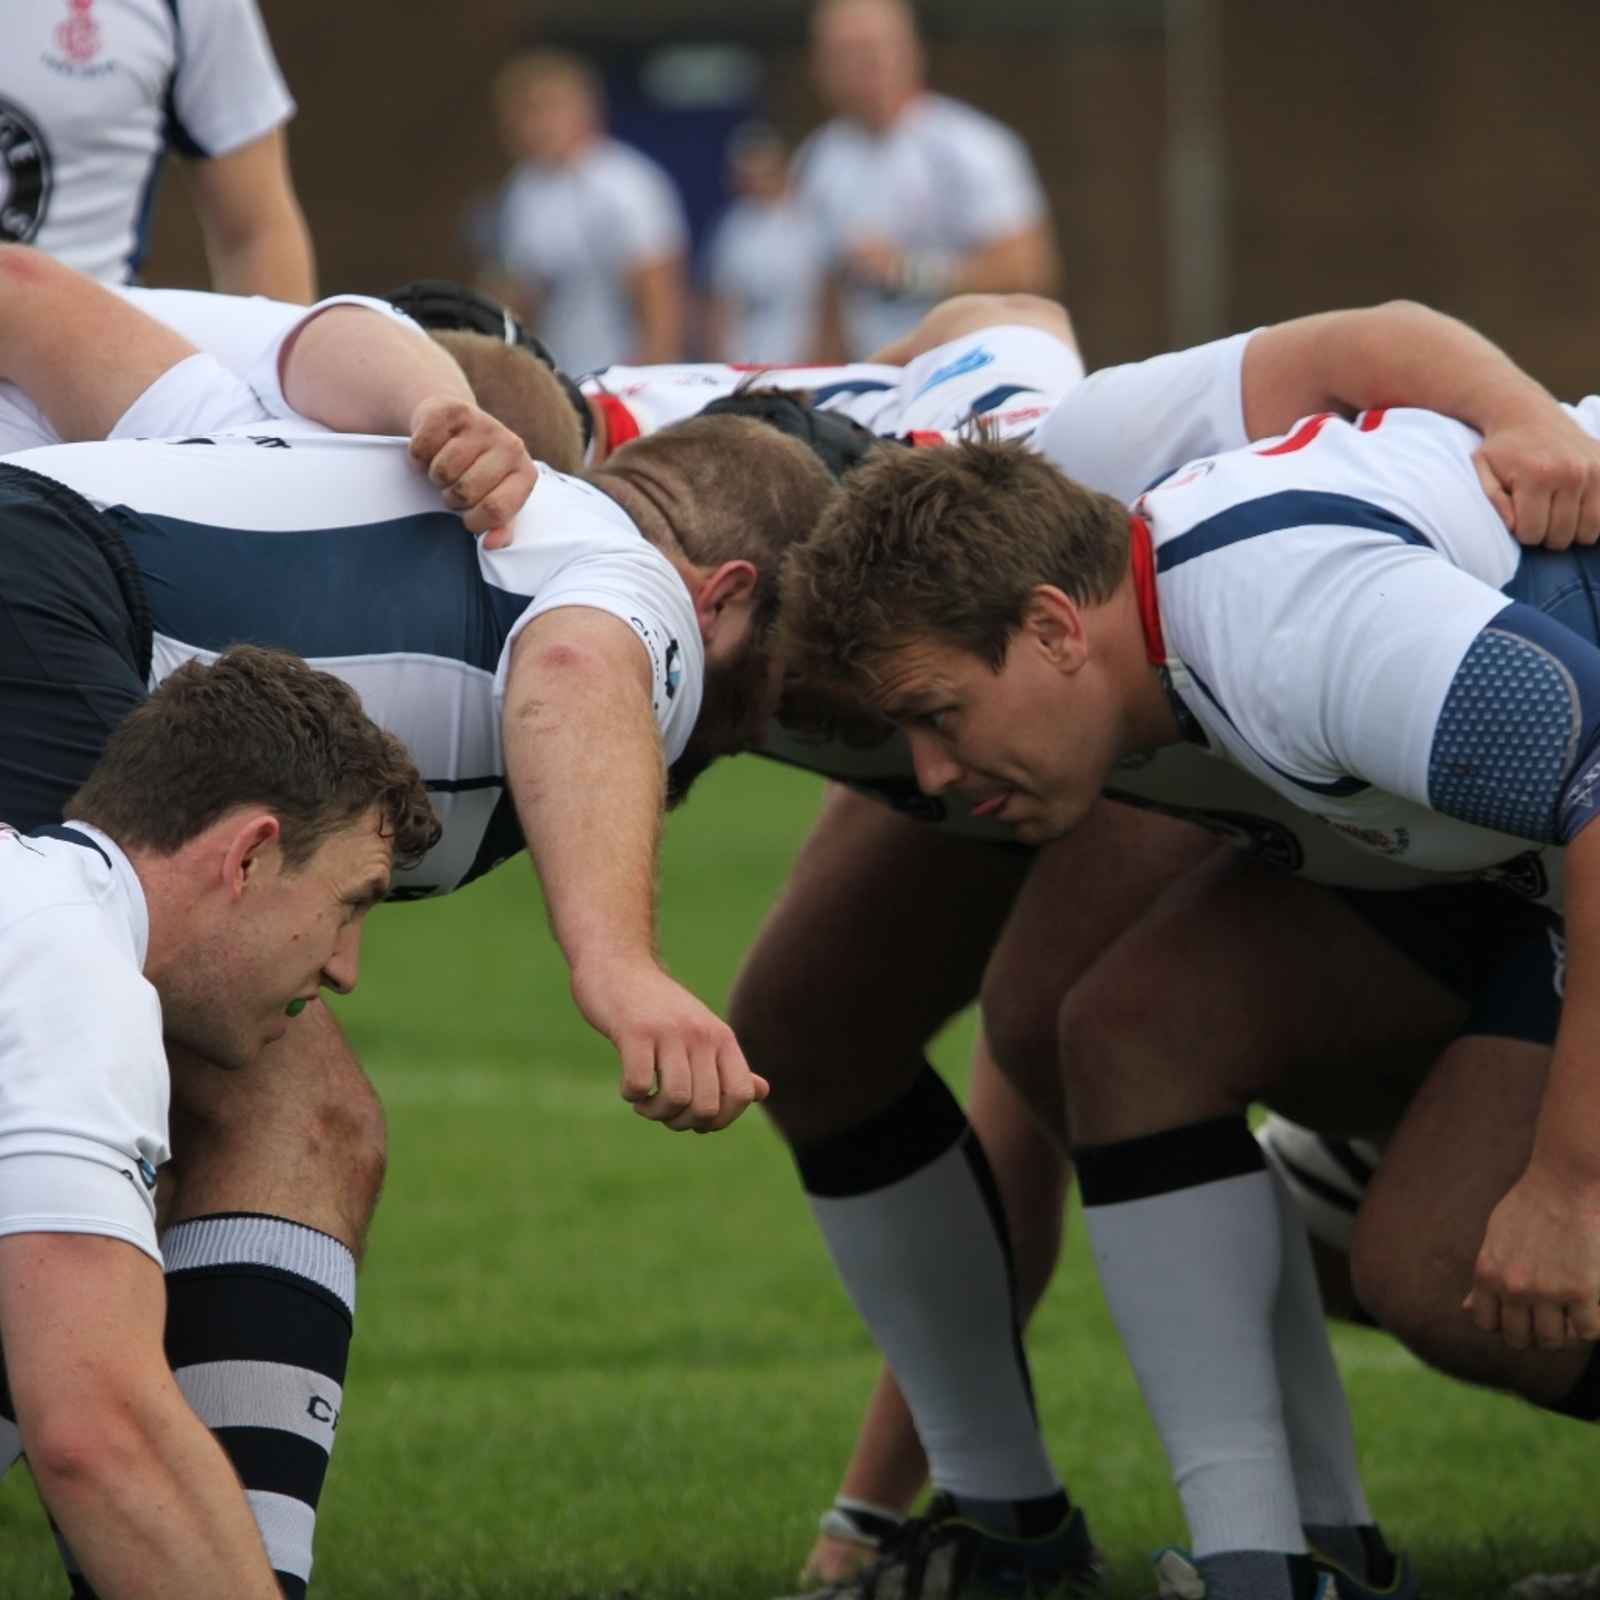 CS v Chelmsford - A Return to Winning Ways